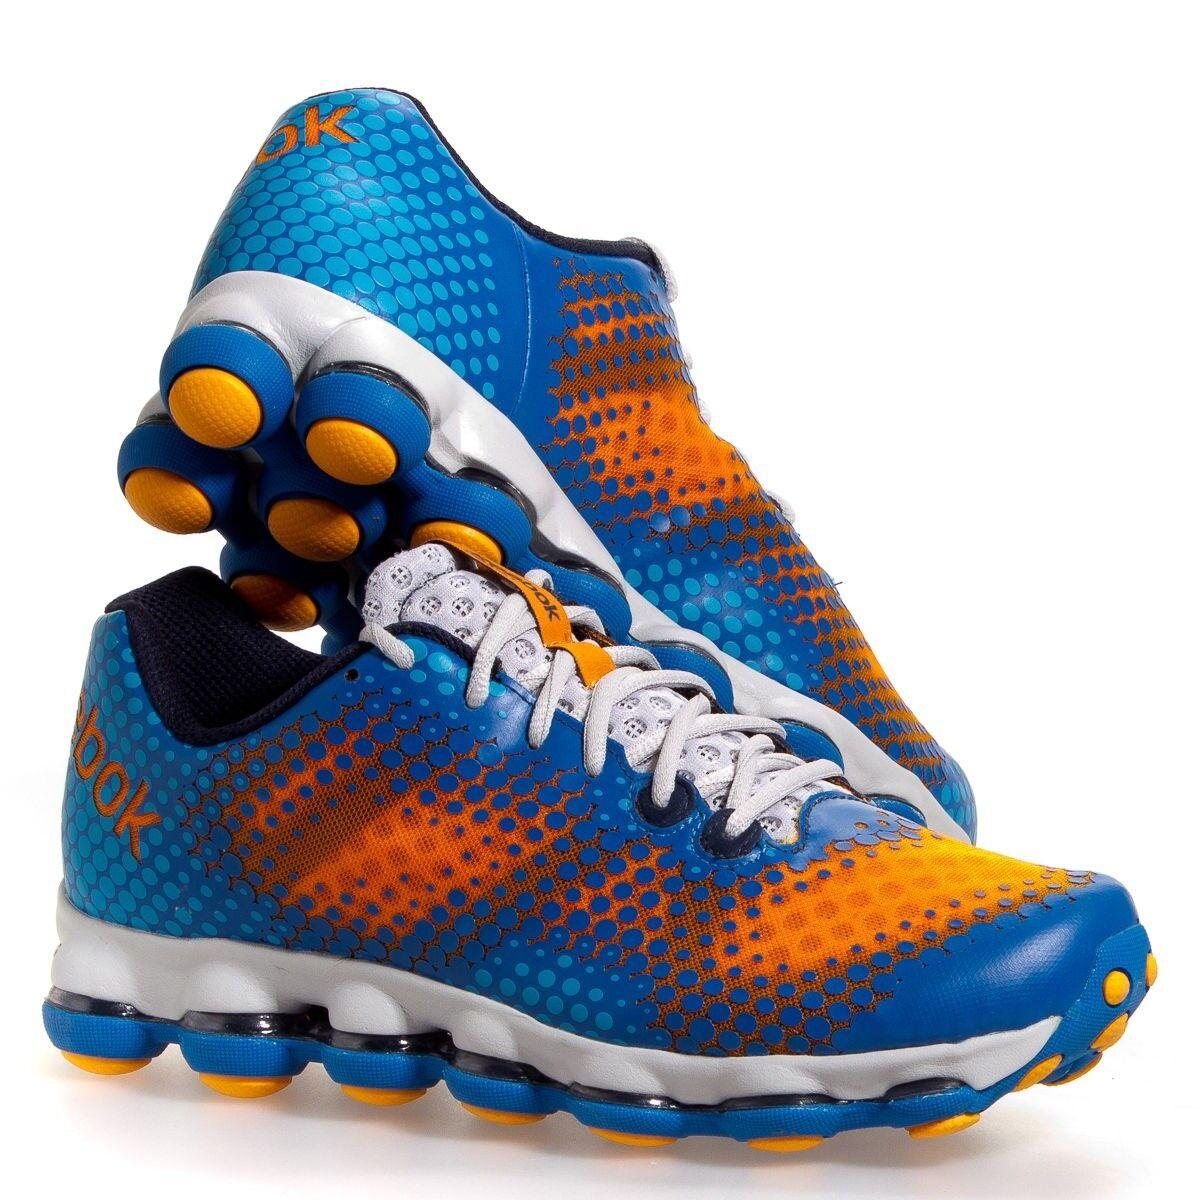 REEBOK DMX Sky Running Schuhes Sneakers Lugs V51968 Uomo Orange Blau New  Uomo V51968 8.5-13 7f5e82